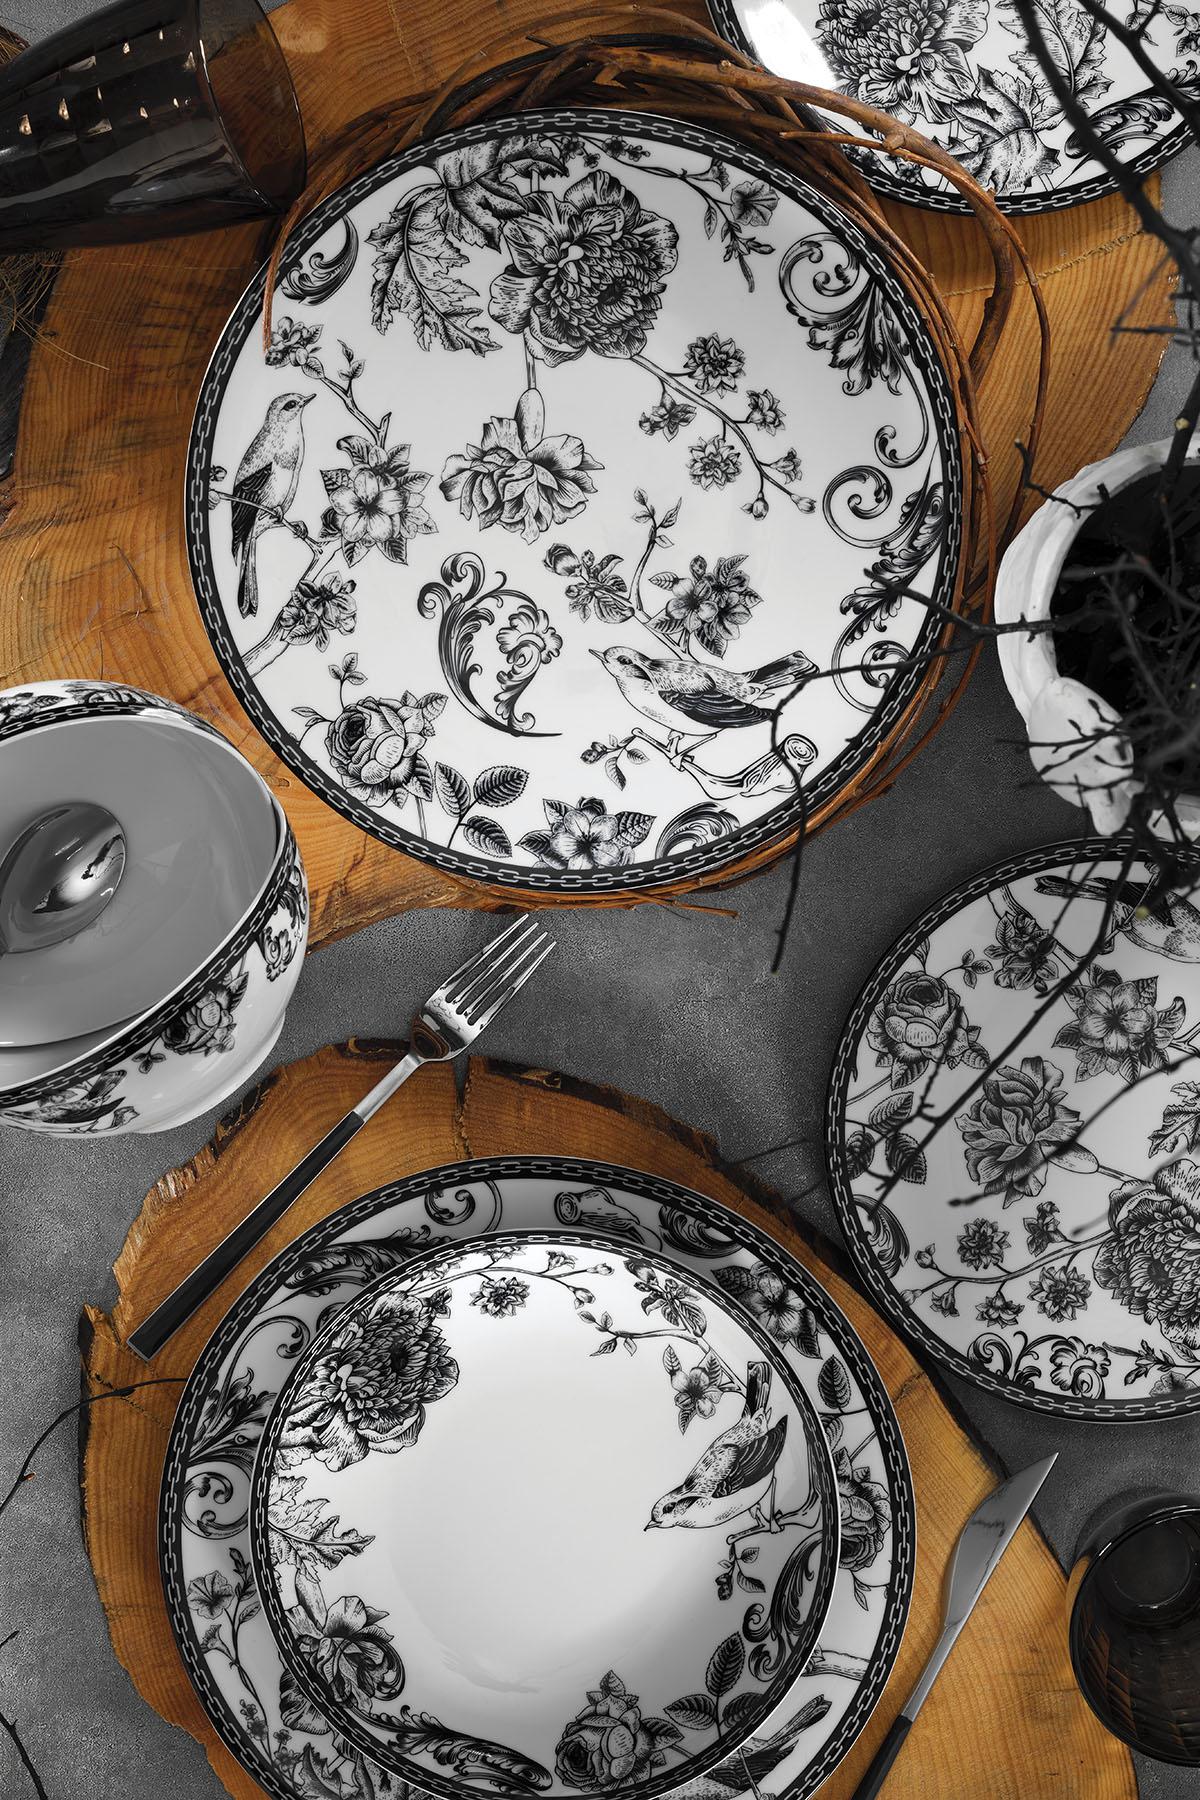 Kütahya Porselen - Kütahya Porselen 939012 Desen 24 Parça Yemek Seti